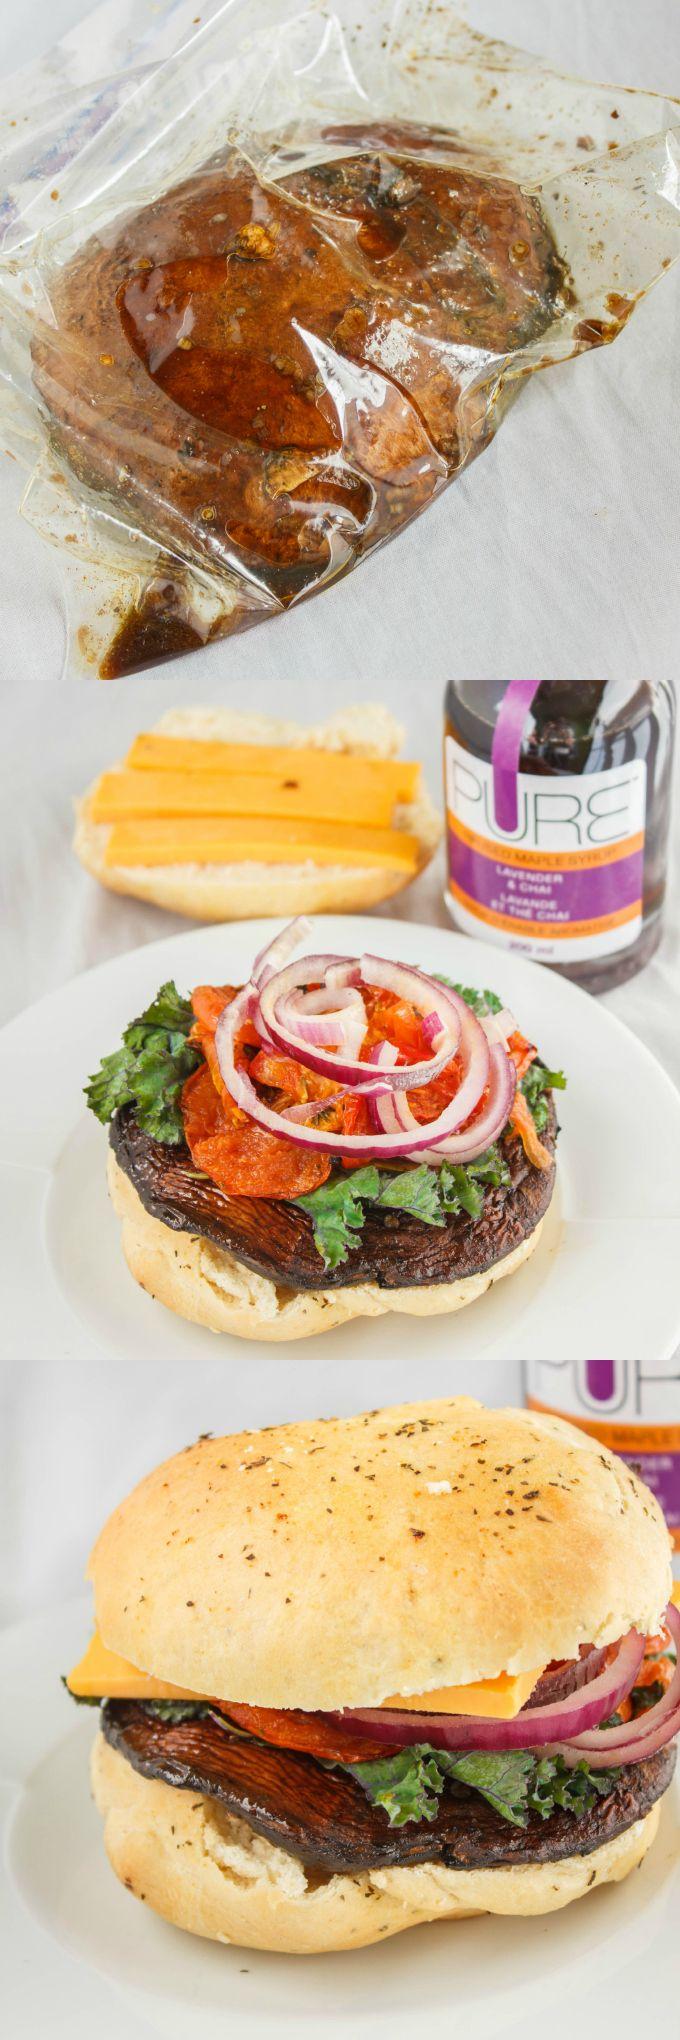 Tutorial How to Make and Grill Portobello Mushroom Burgers 1